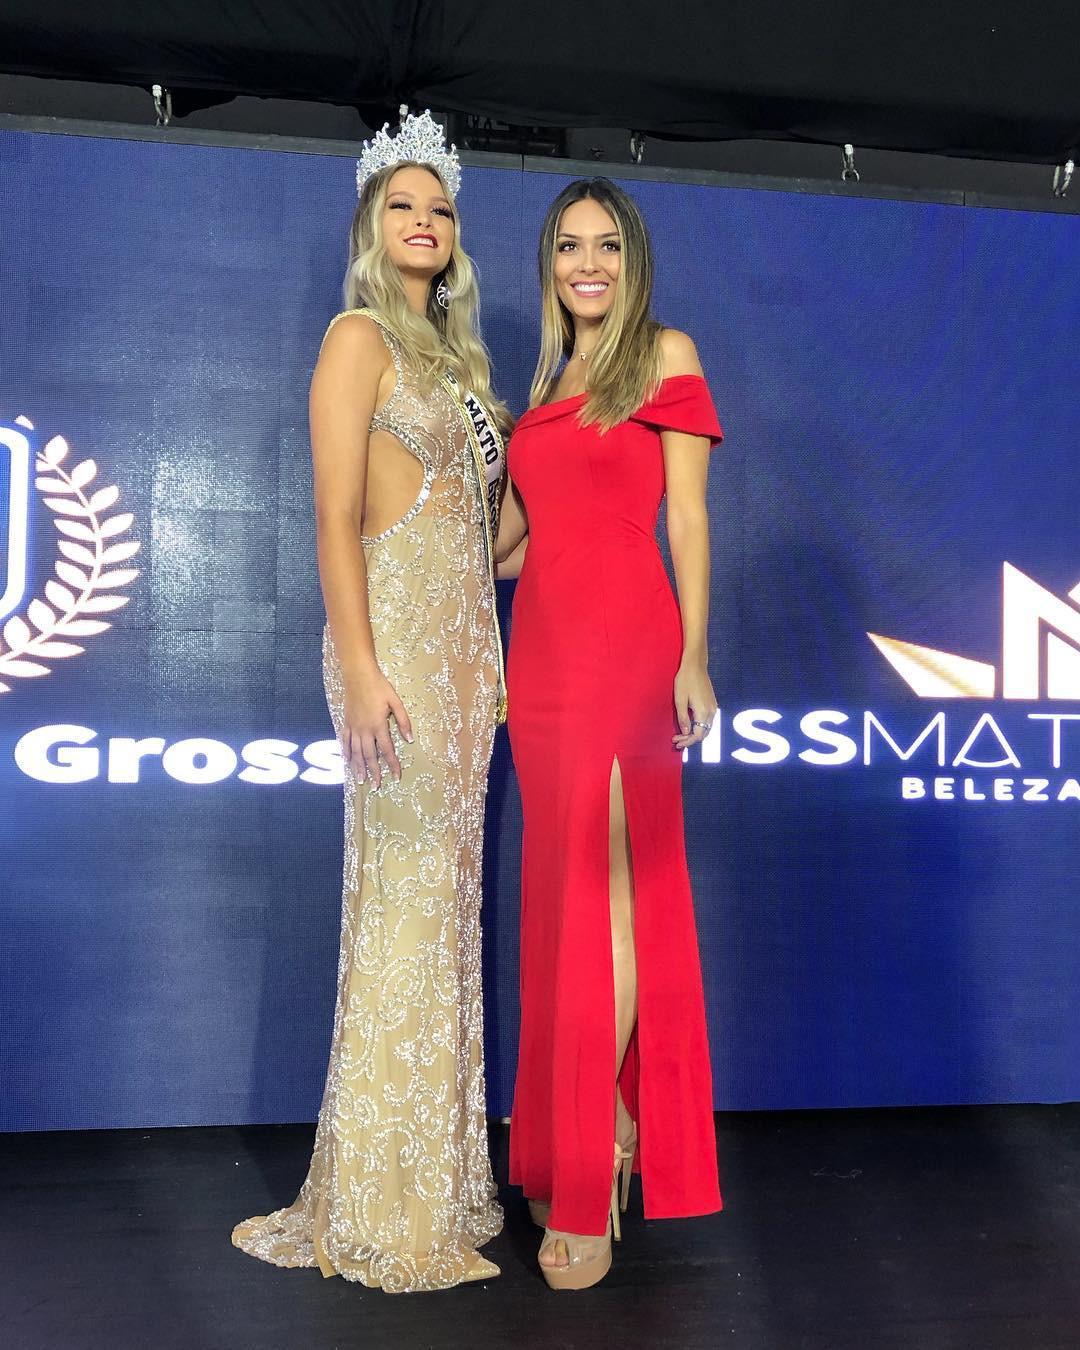 larissa neiverth, top 20 de miss brasil mundo 2019. - Página 5 Qgm4f210